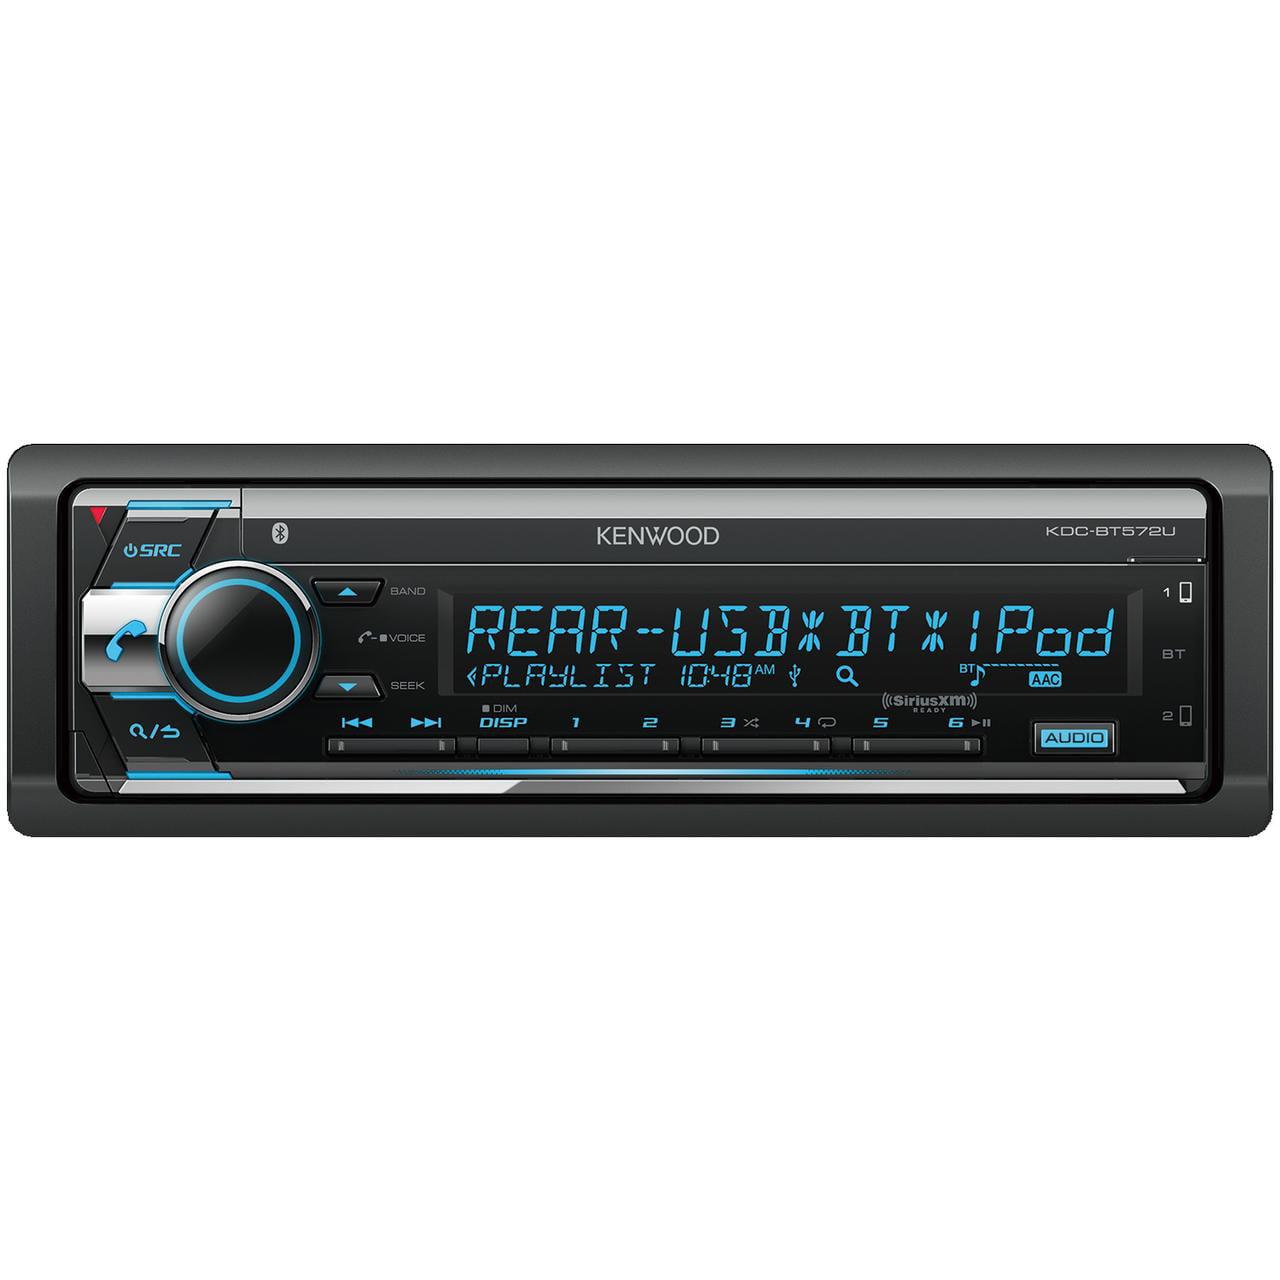 Kenwood KDC-BT572U Single-Din In-Dash CD Receiver With Bluetooth & SiriusXM Ready